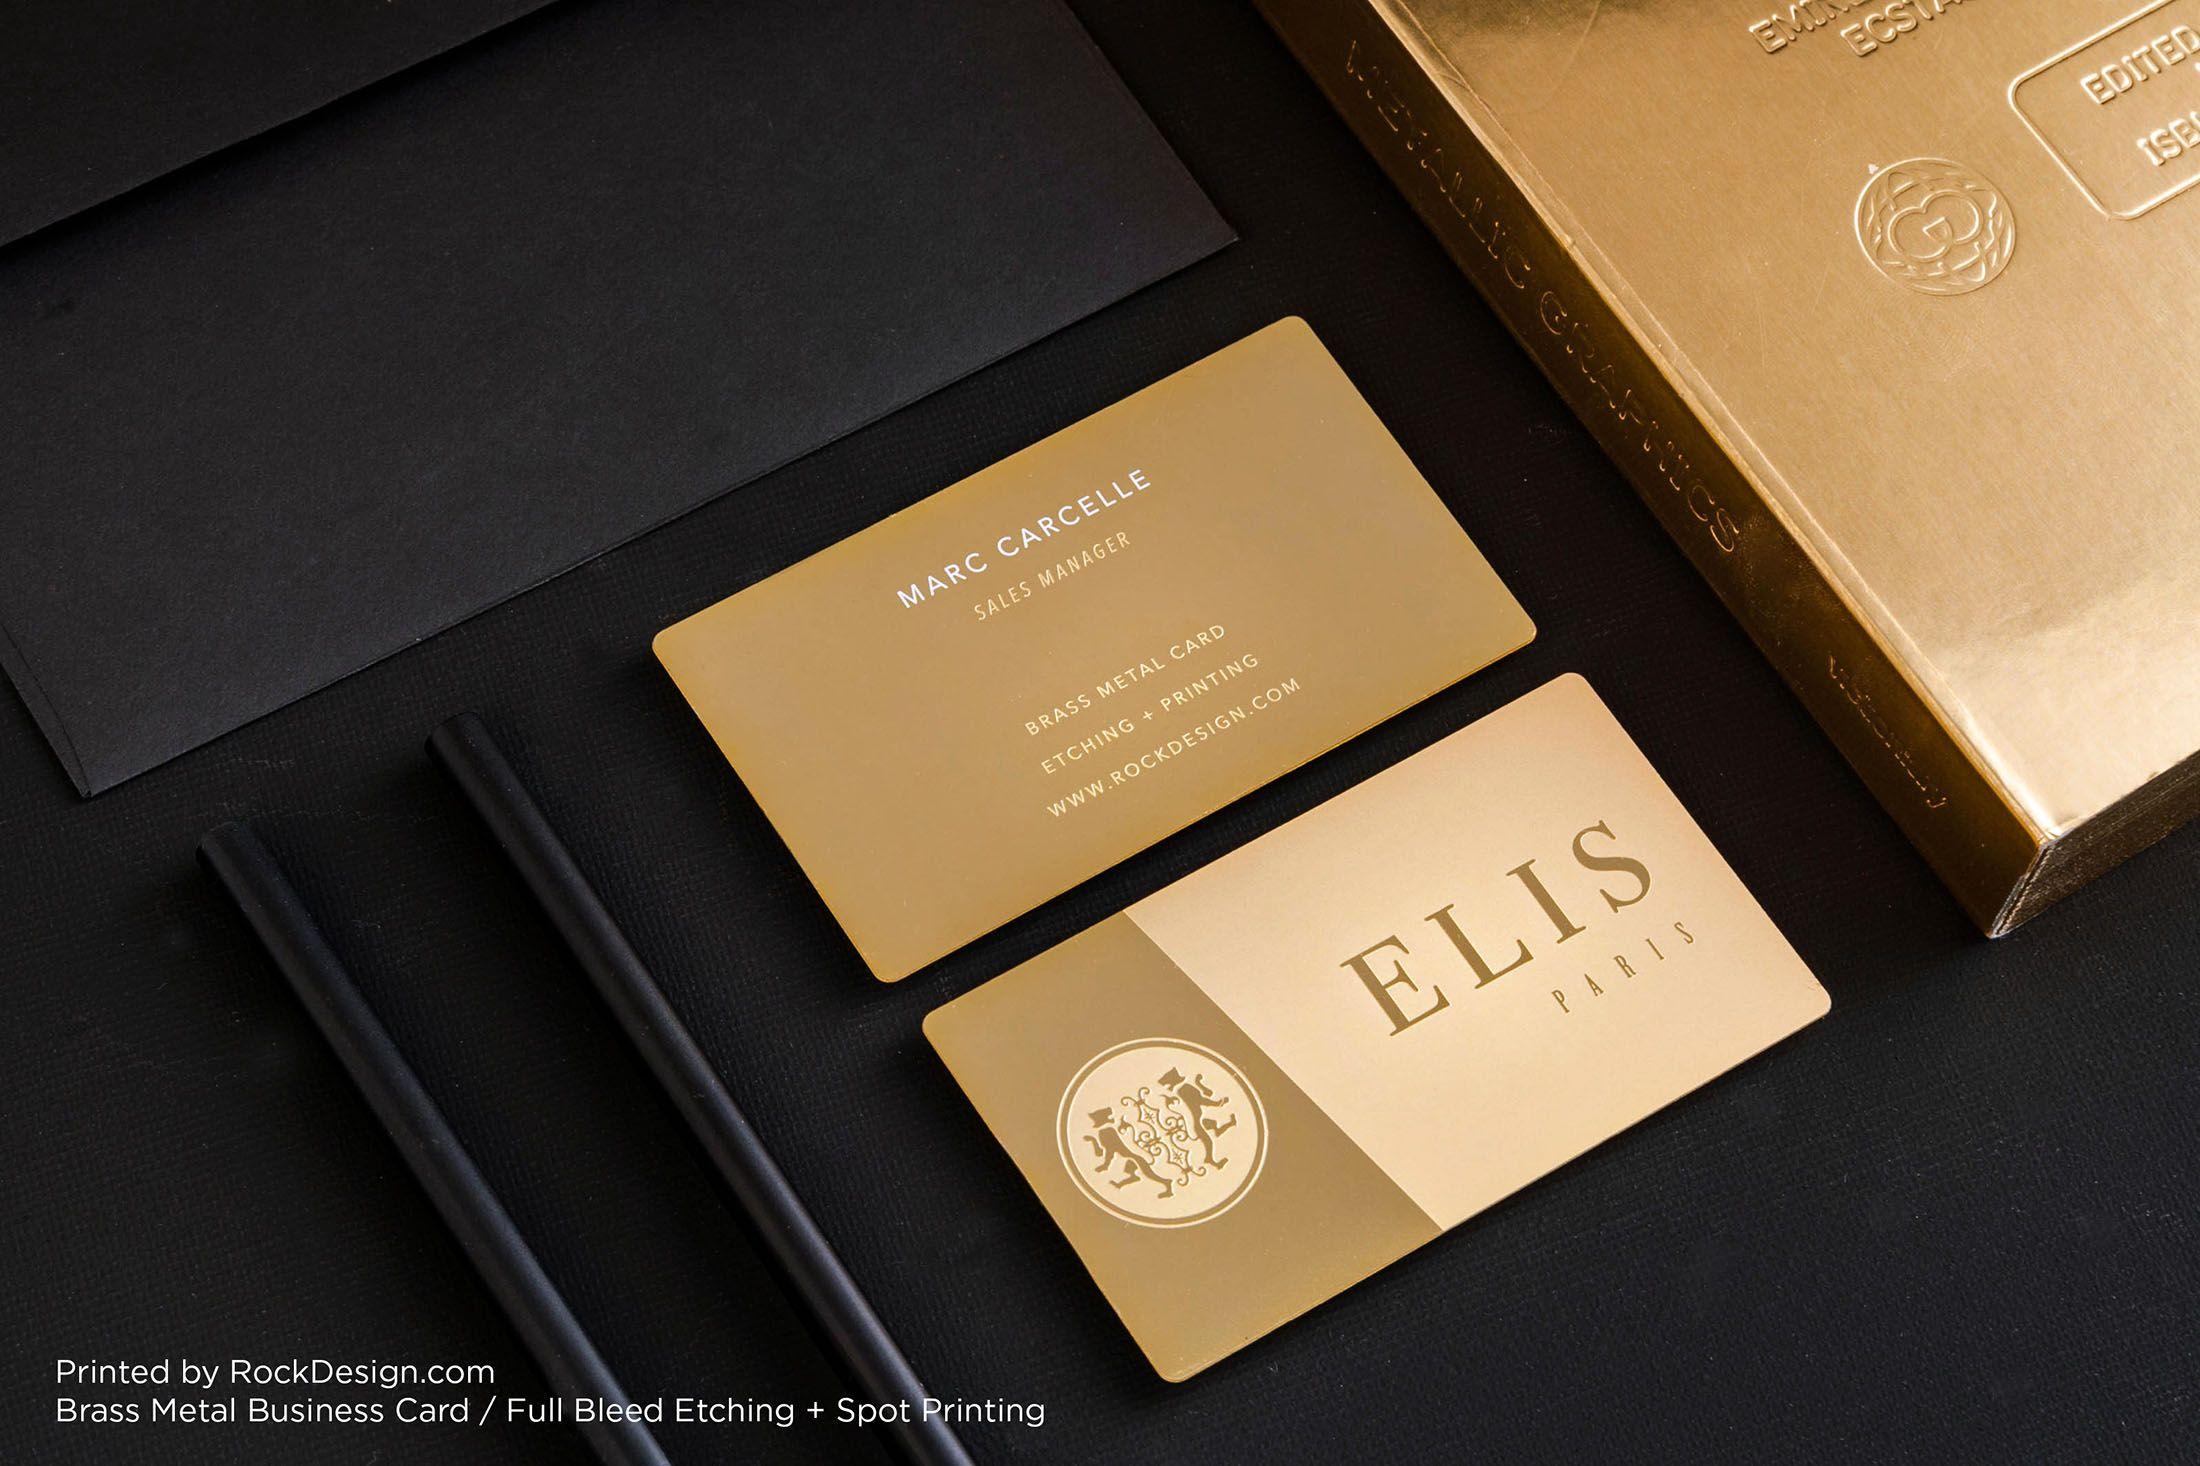 Luxury modern gold metal card elis rockdesign luxury business luxury modern gold metal card elis rockdesign luxury business card printing reheart Images